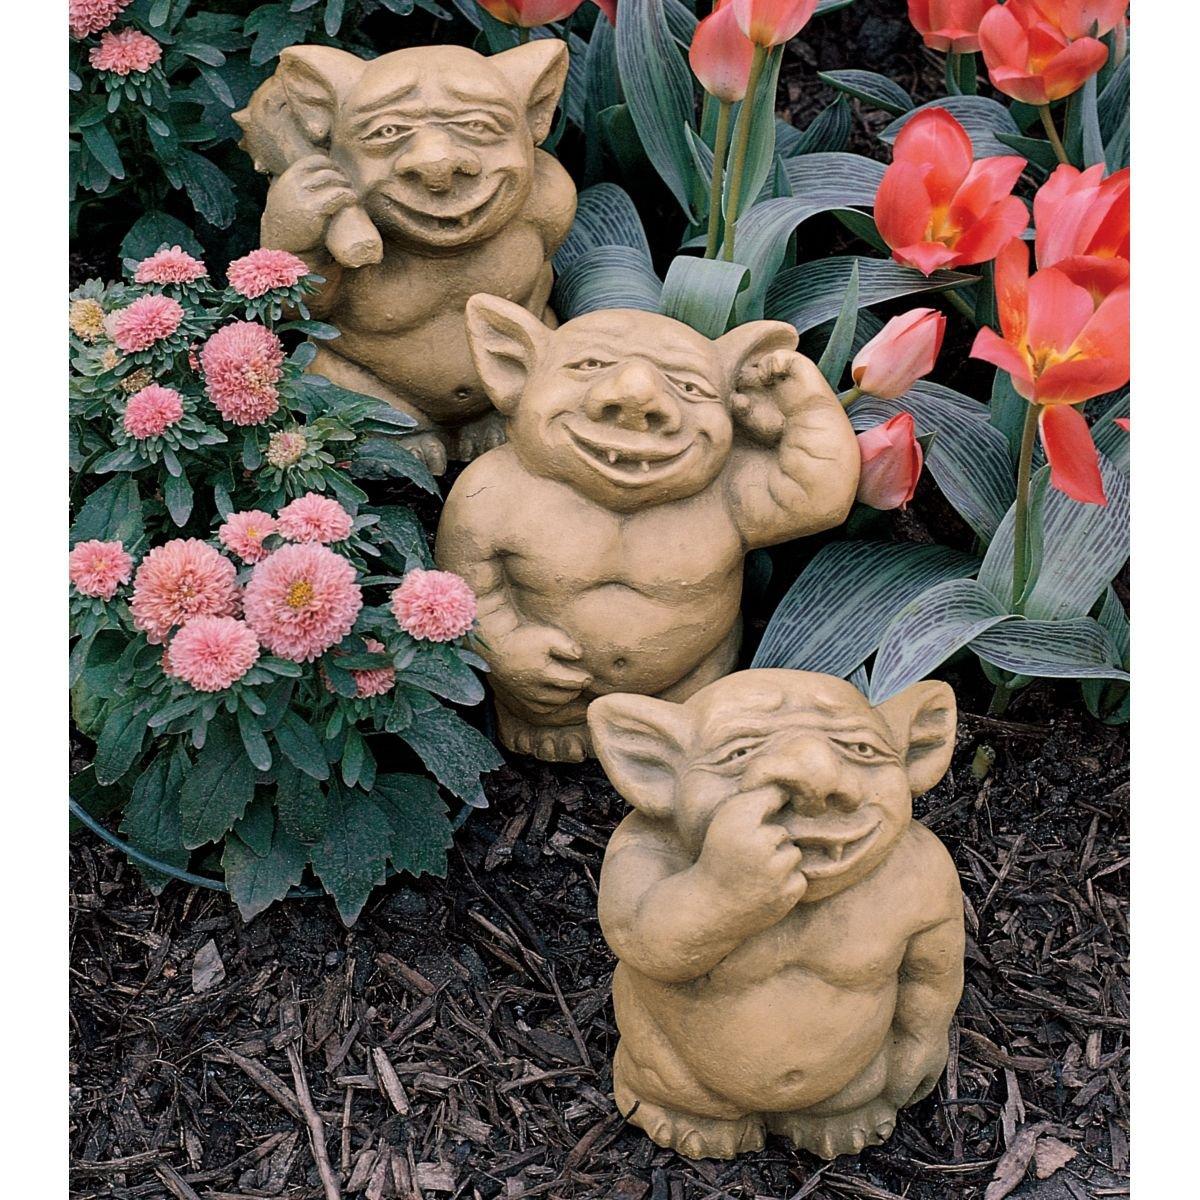 Design Toscano OS68559 OS68559 OS68559 - Figurín para jardín 0b03df